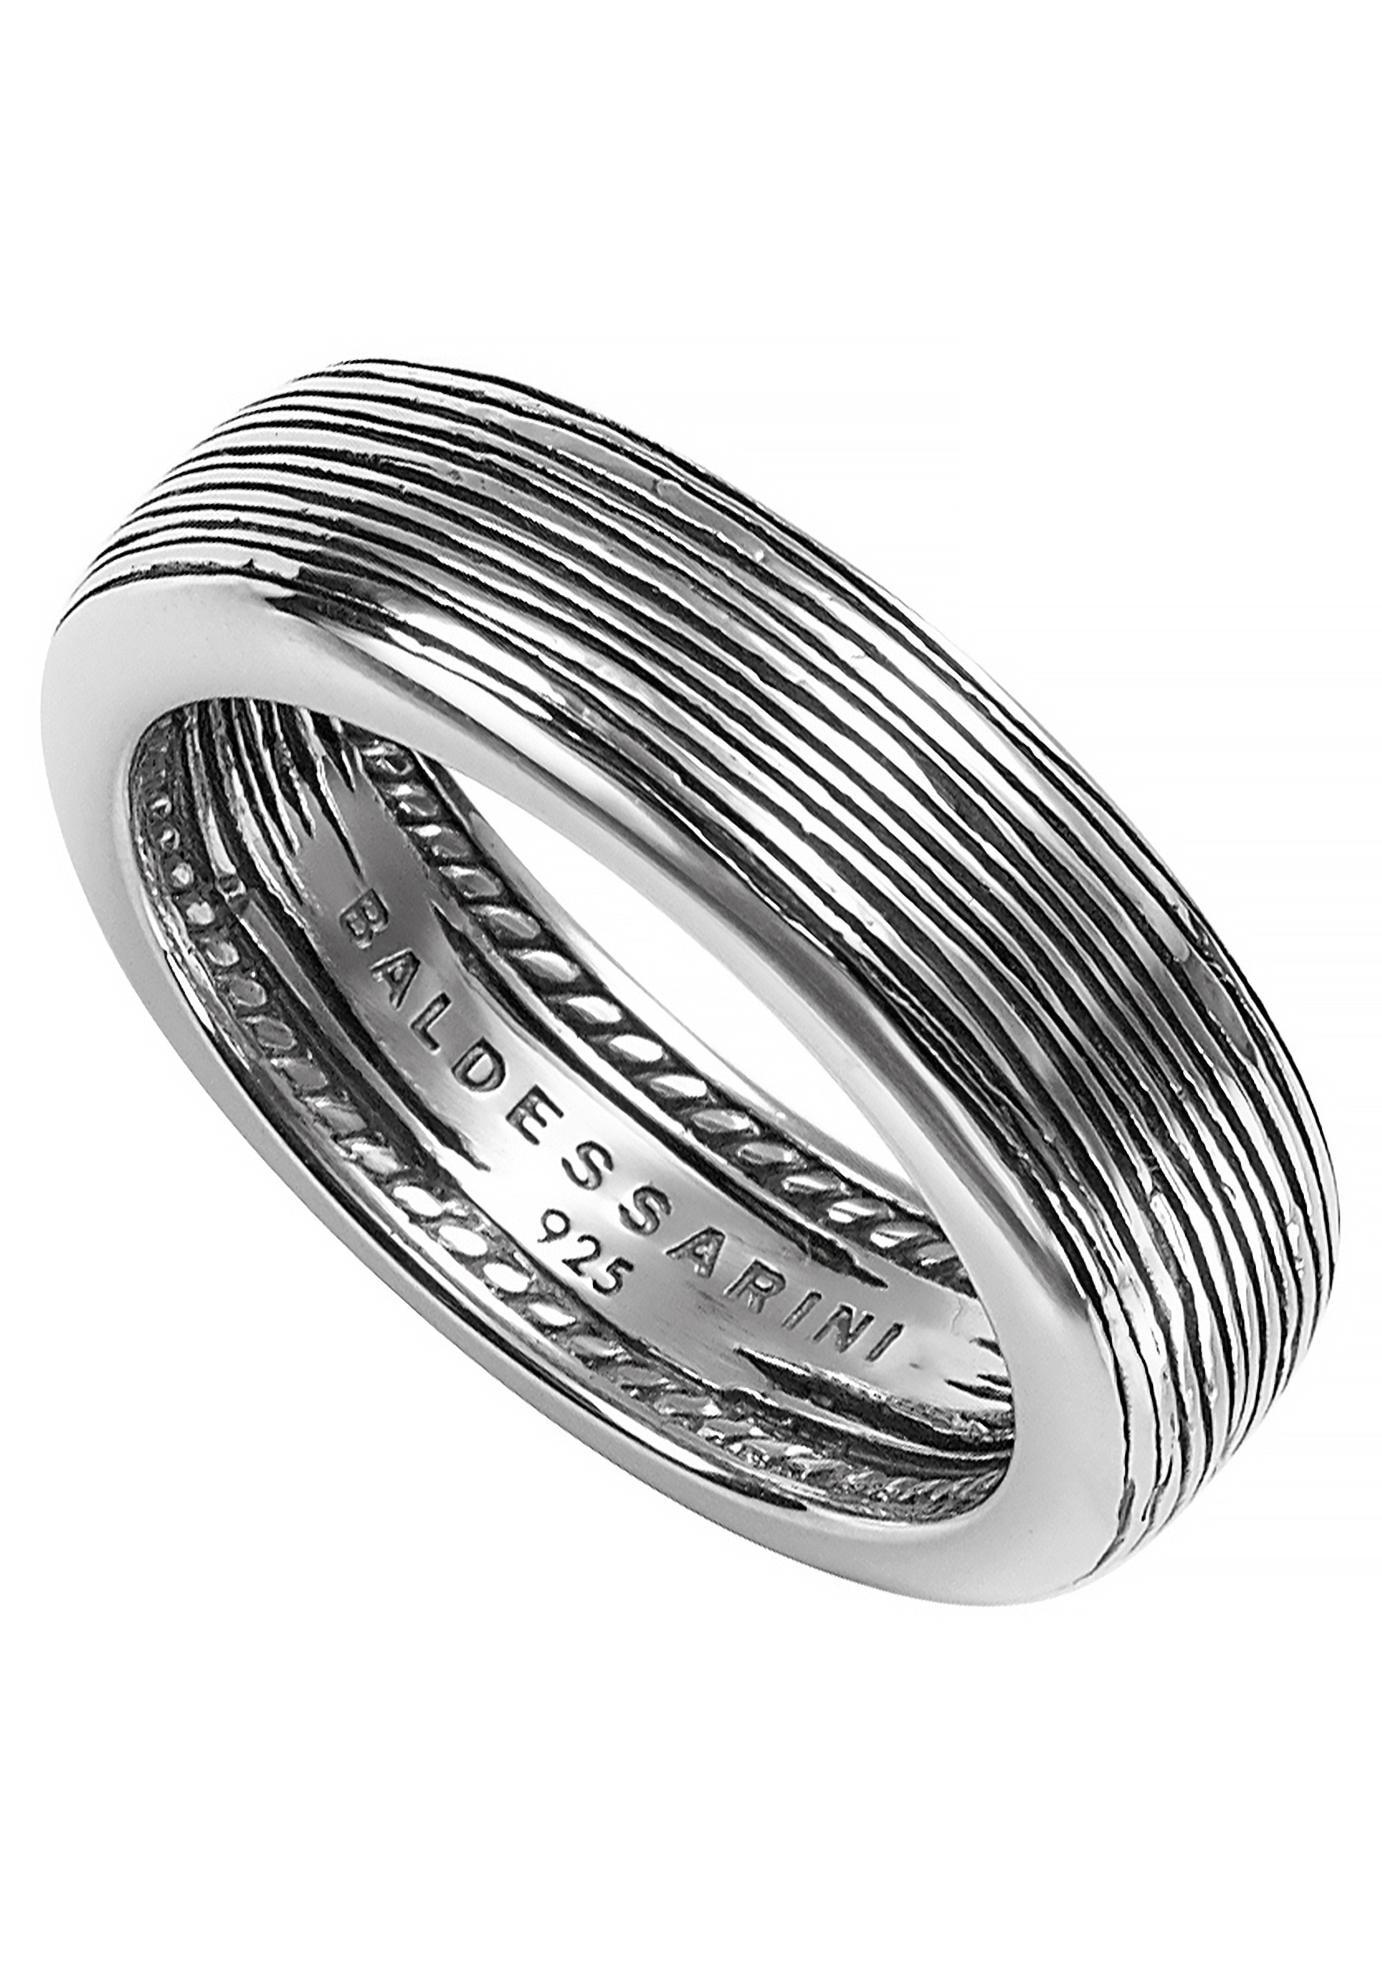 BALDESSARINI Silberring Y1069R/90/00/62 | Schmuck > Ringe > Silberringe | Baldessarini